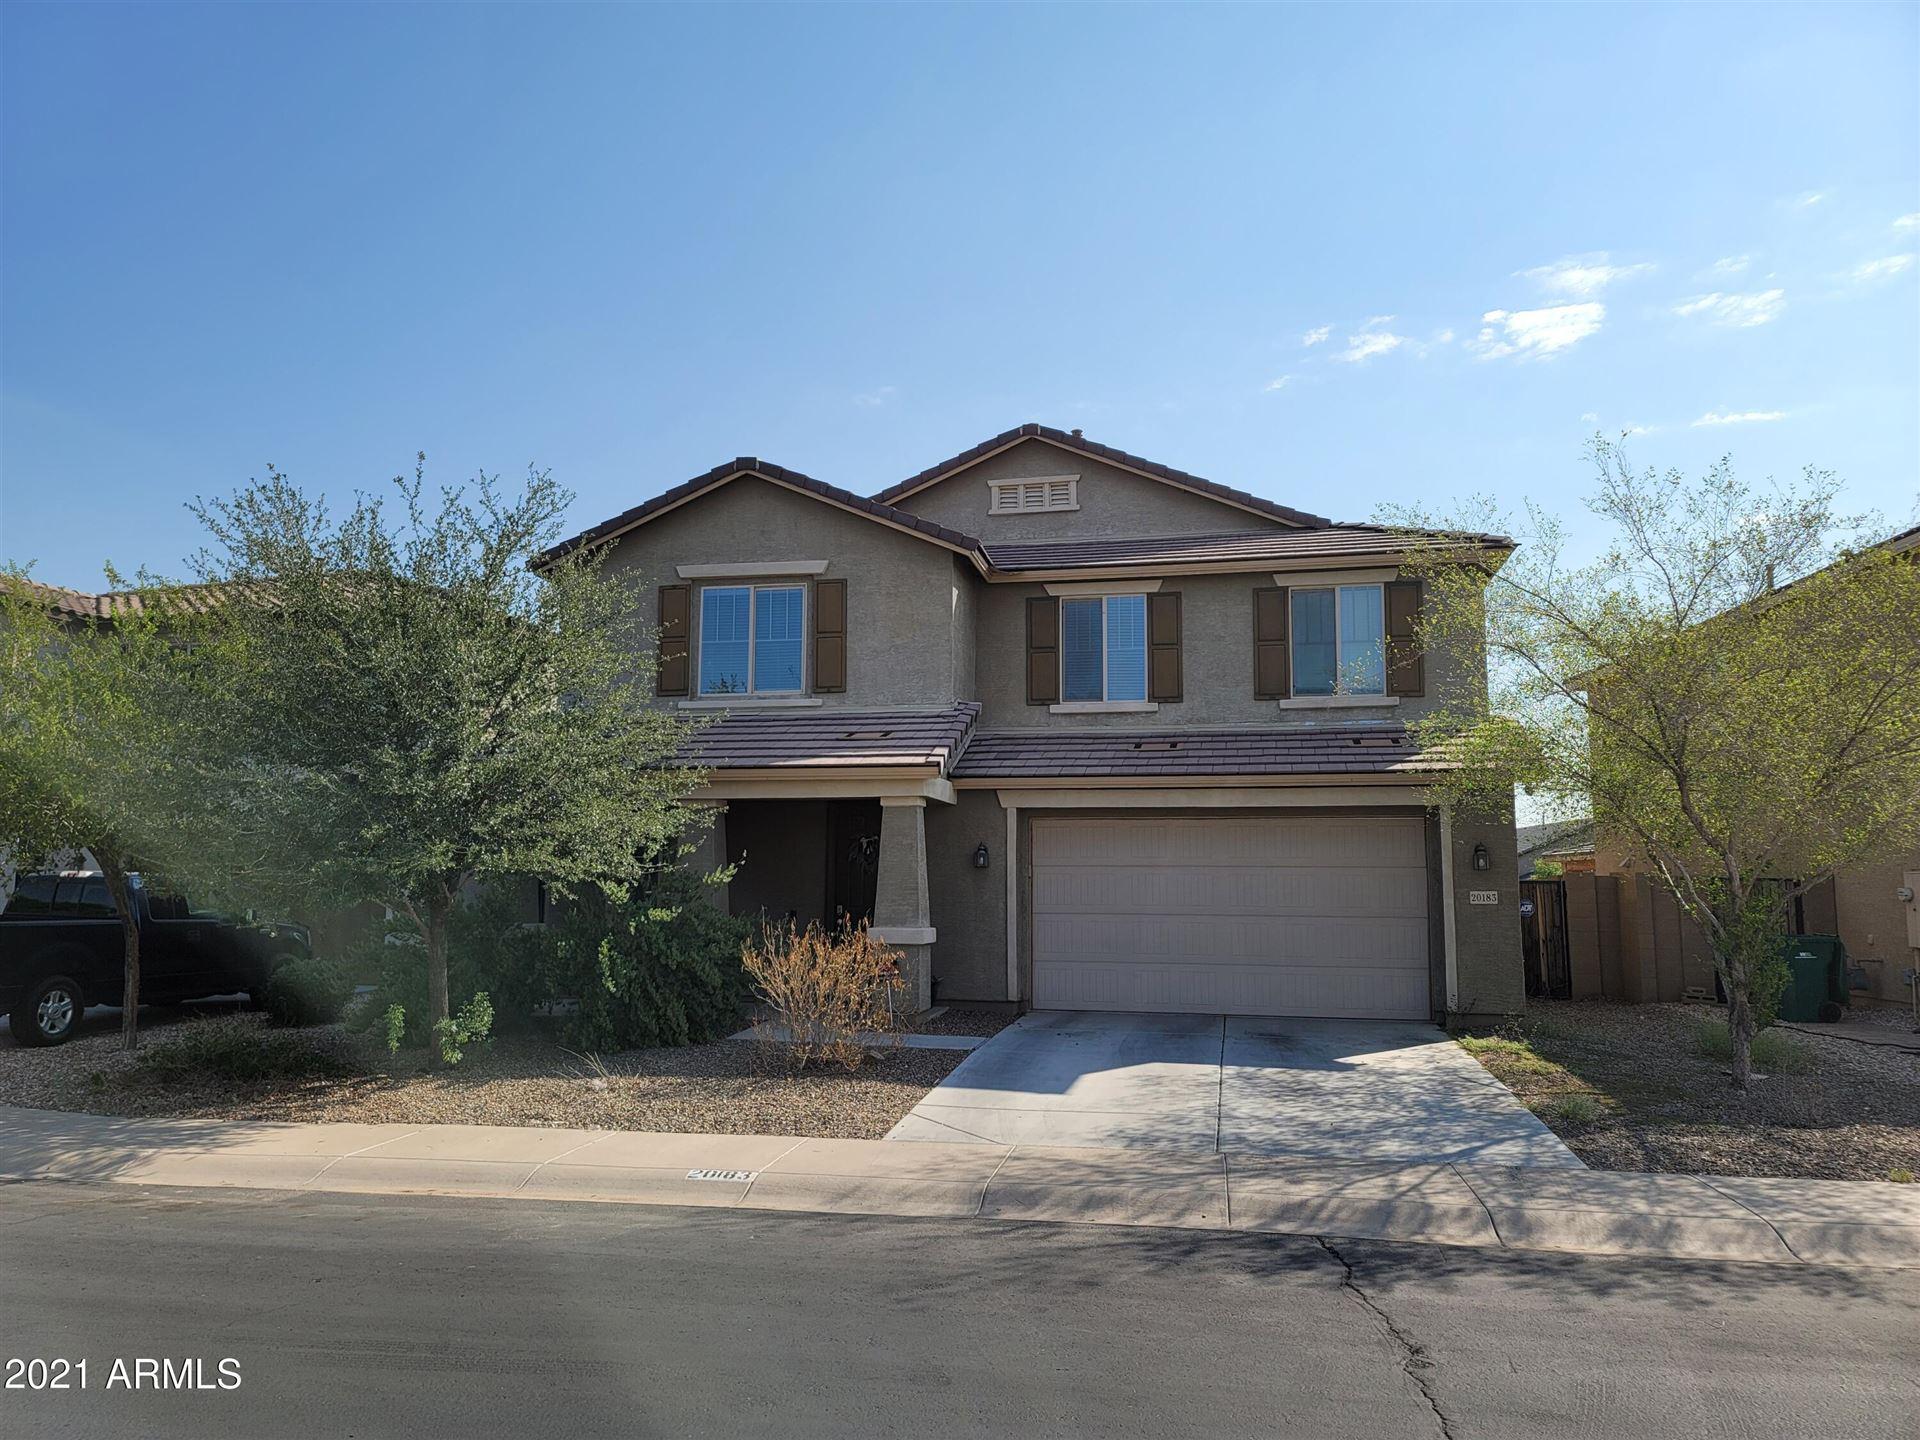 Photo of 20183 N MARQUEZ Drive, Maricopa, AZ 85138 (MLS # 6294231)